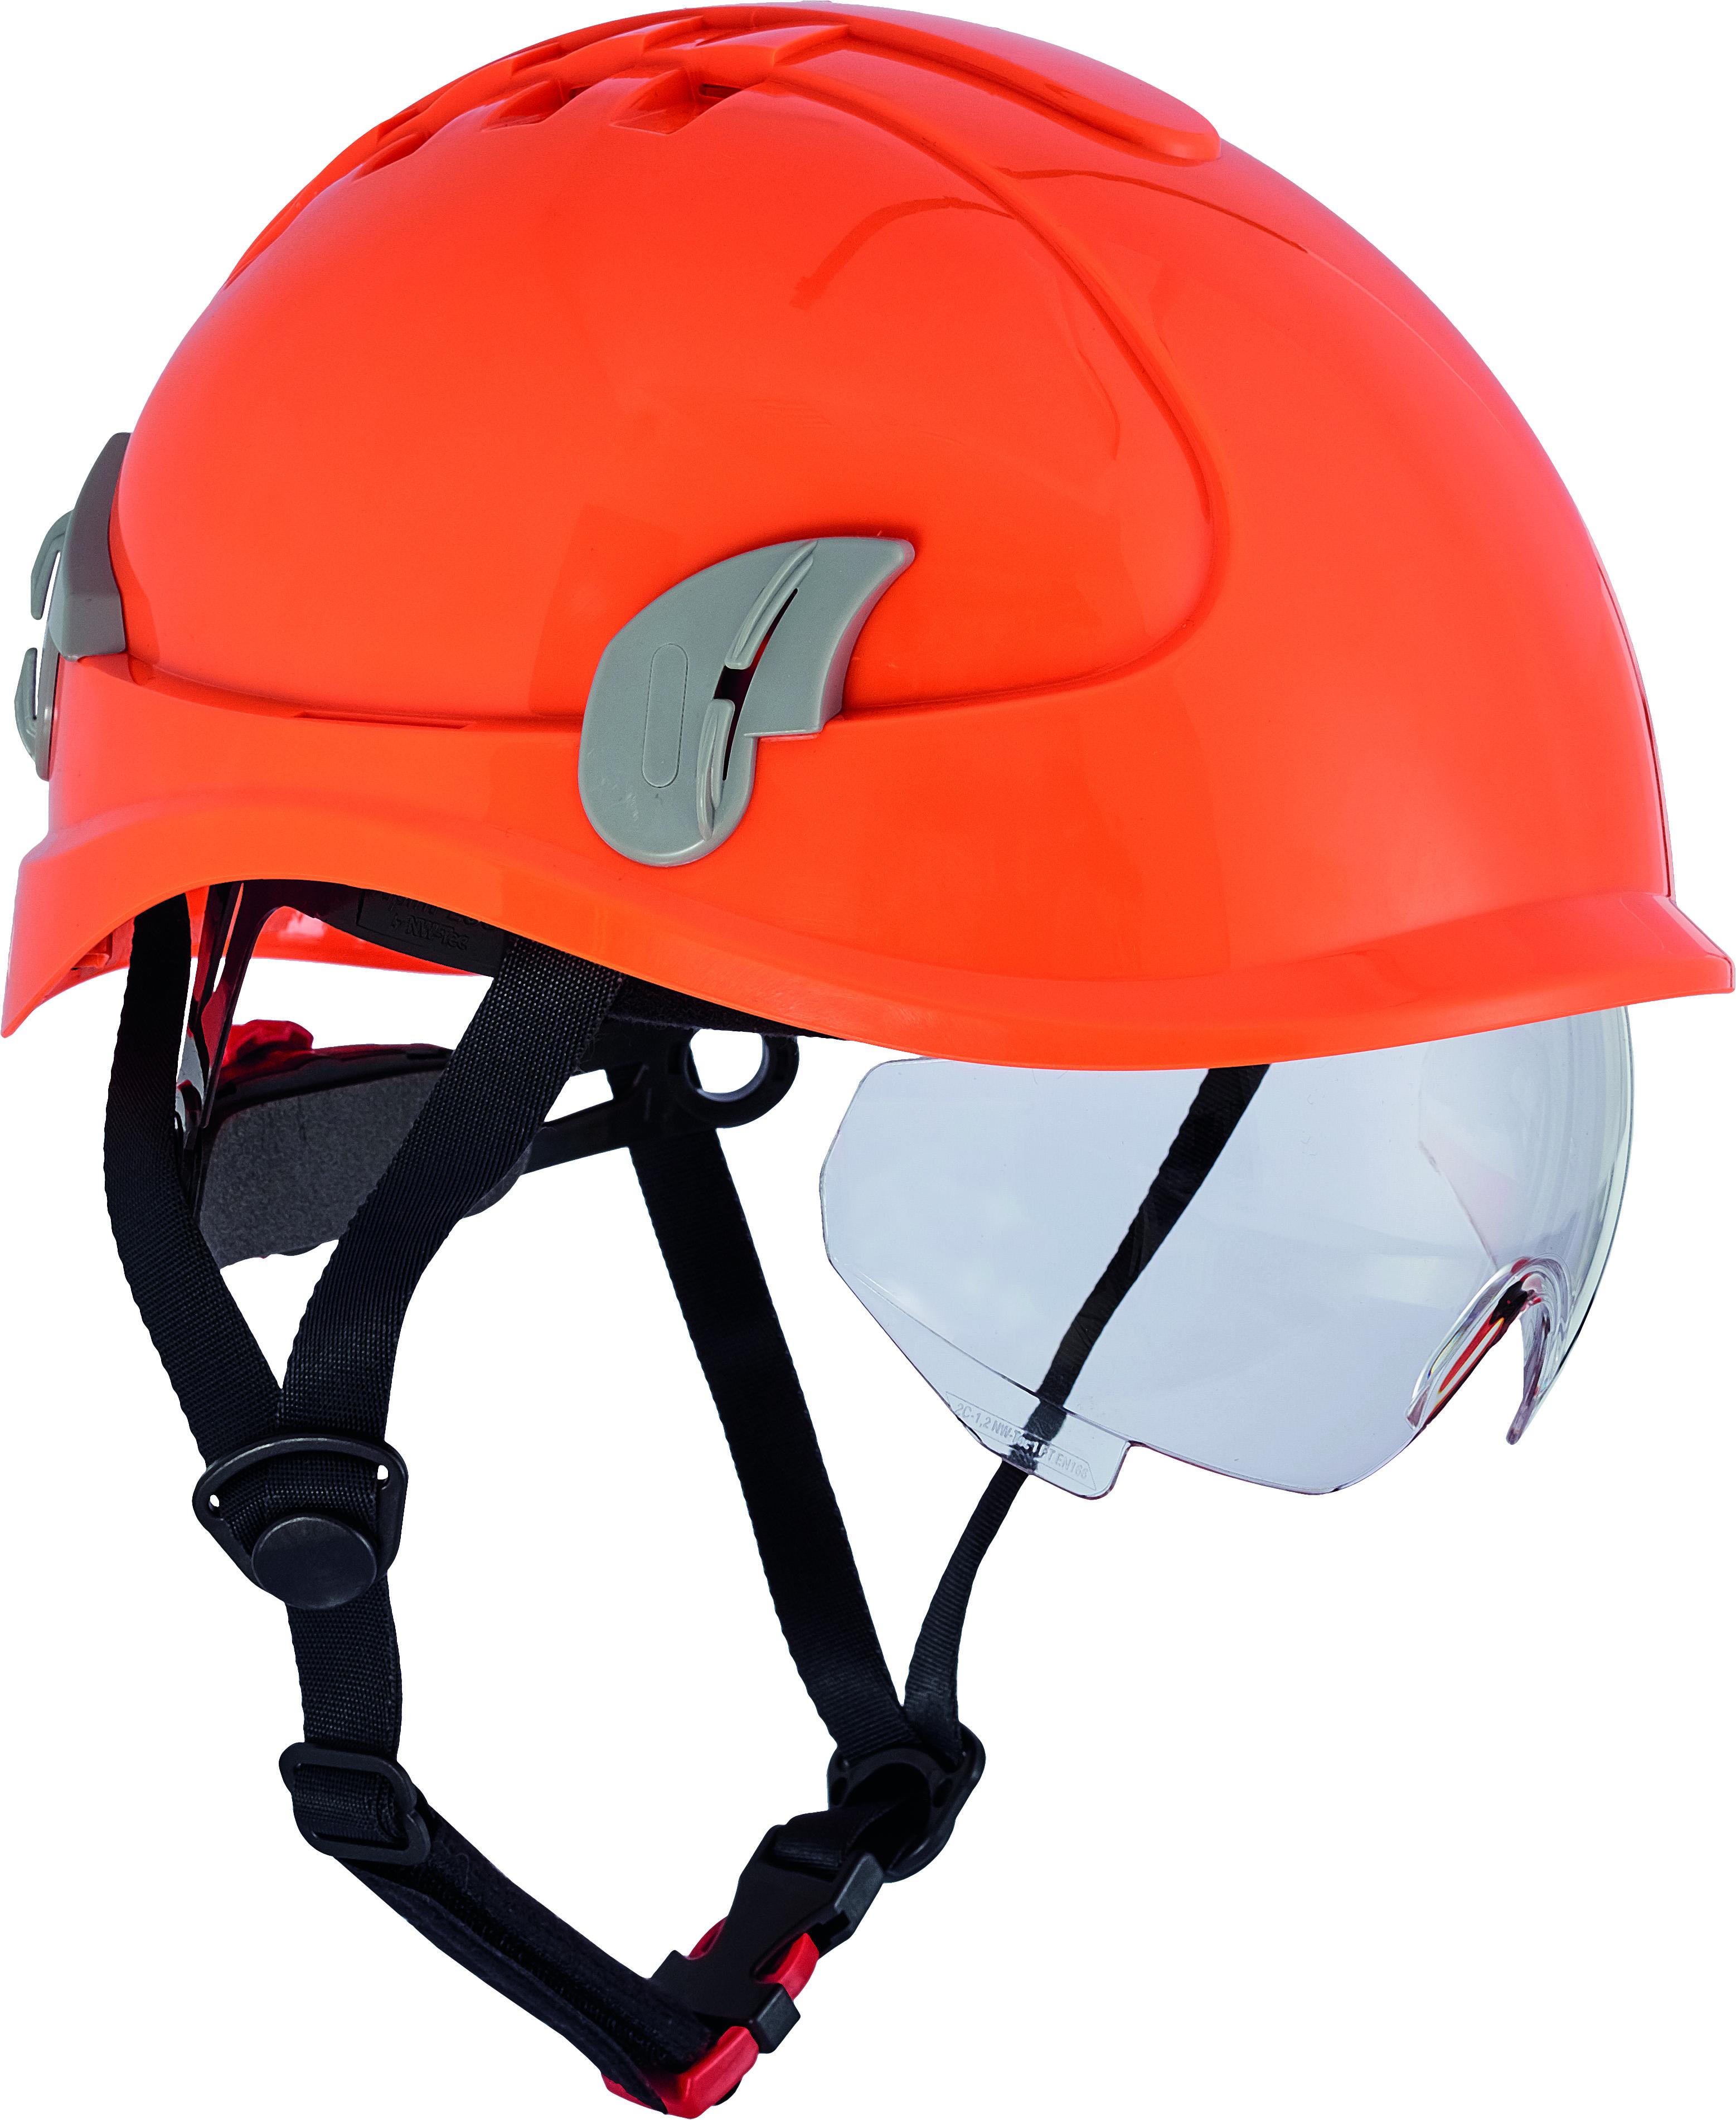 ALPINWORKER orange přilba prac. 06010122 96